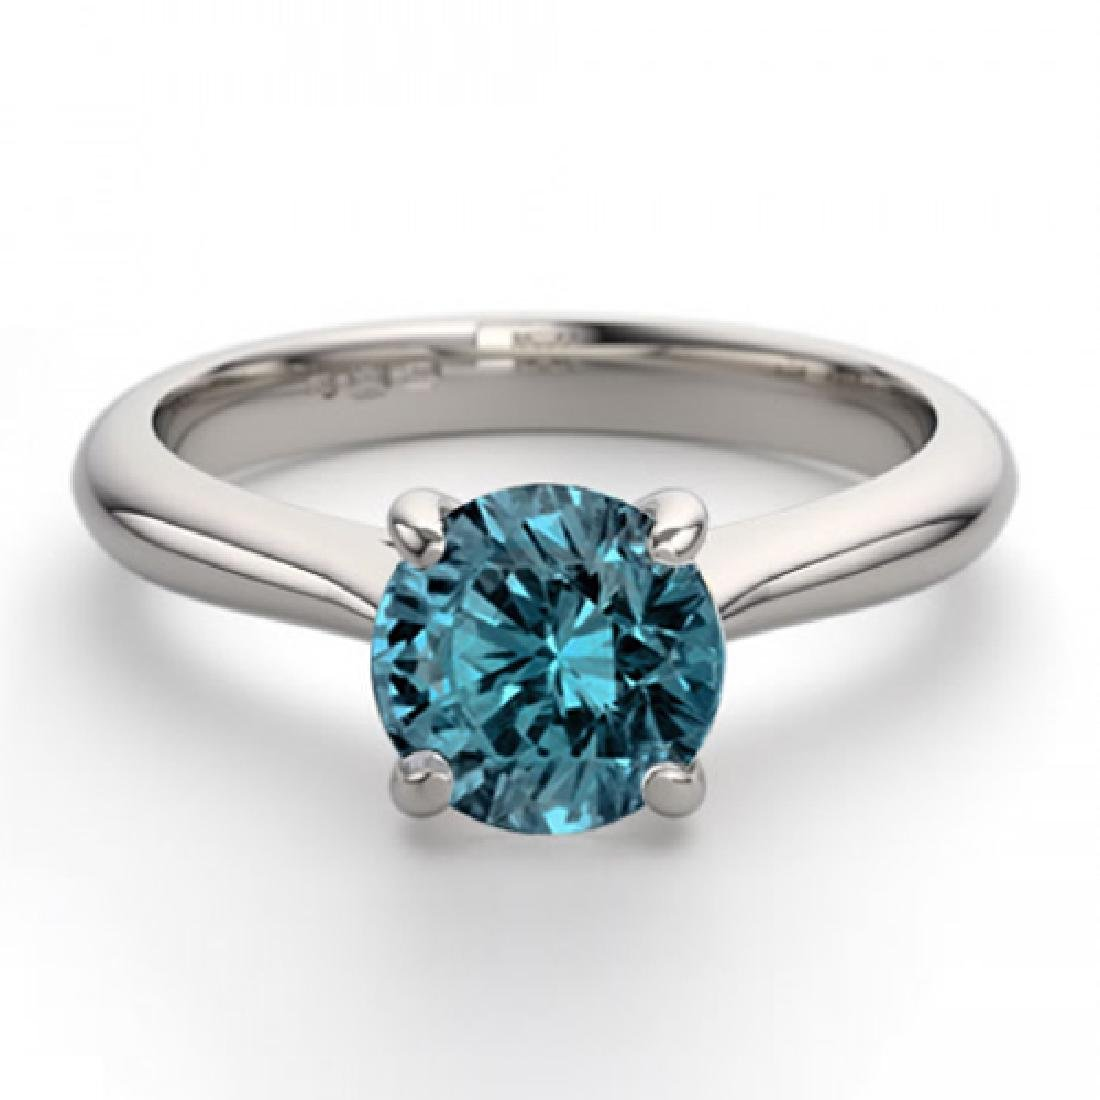 14K White Gold 1.36 ctw Blue Diamond Solitaire Ring -